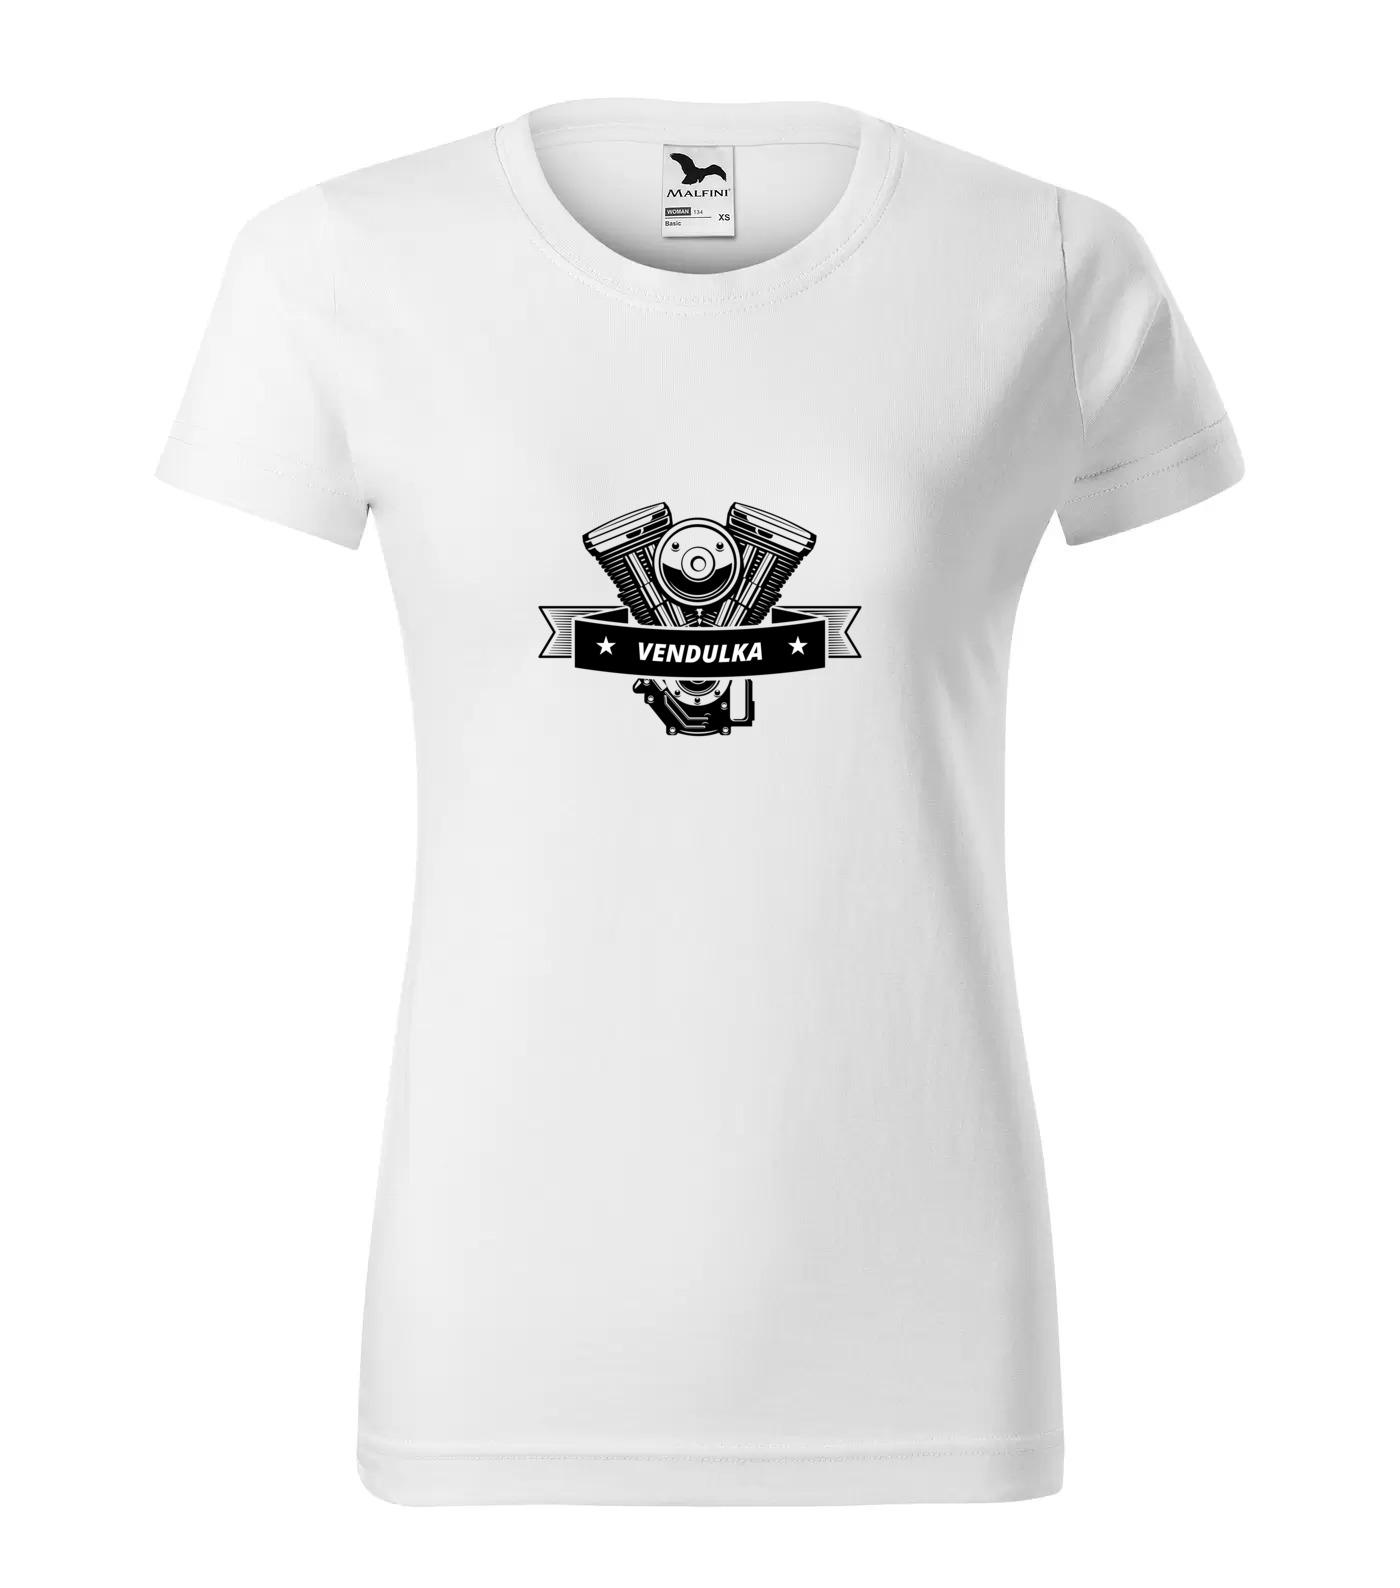 Tričko Motorkářka Vendulka